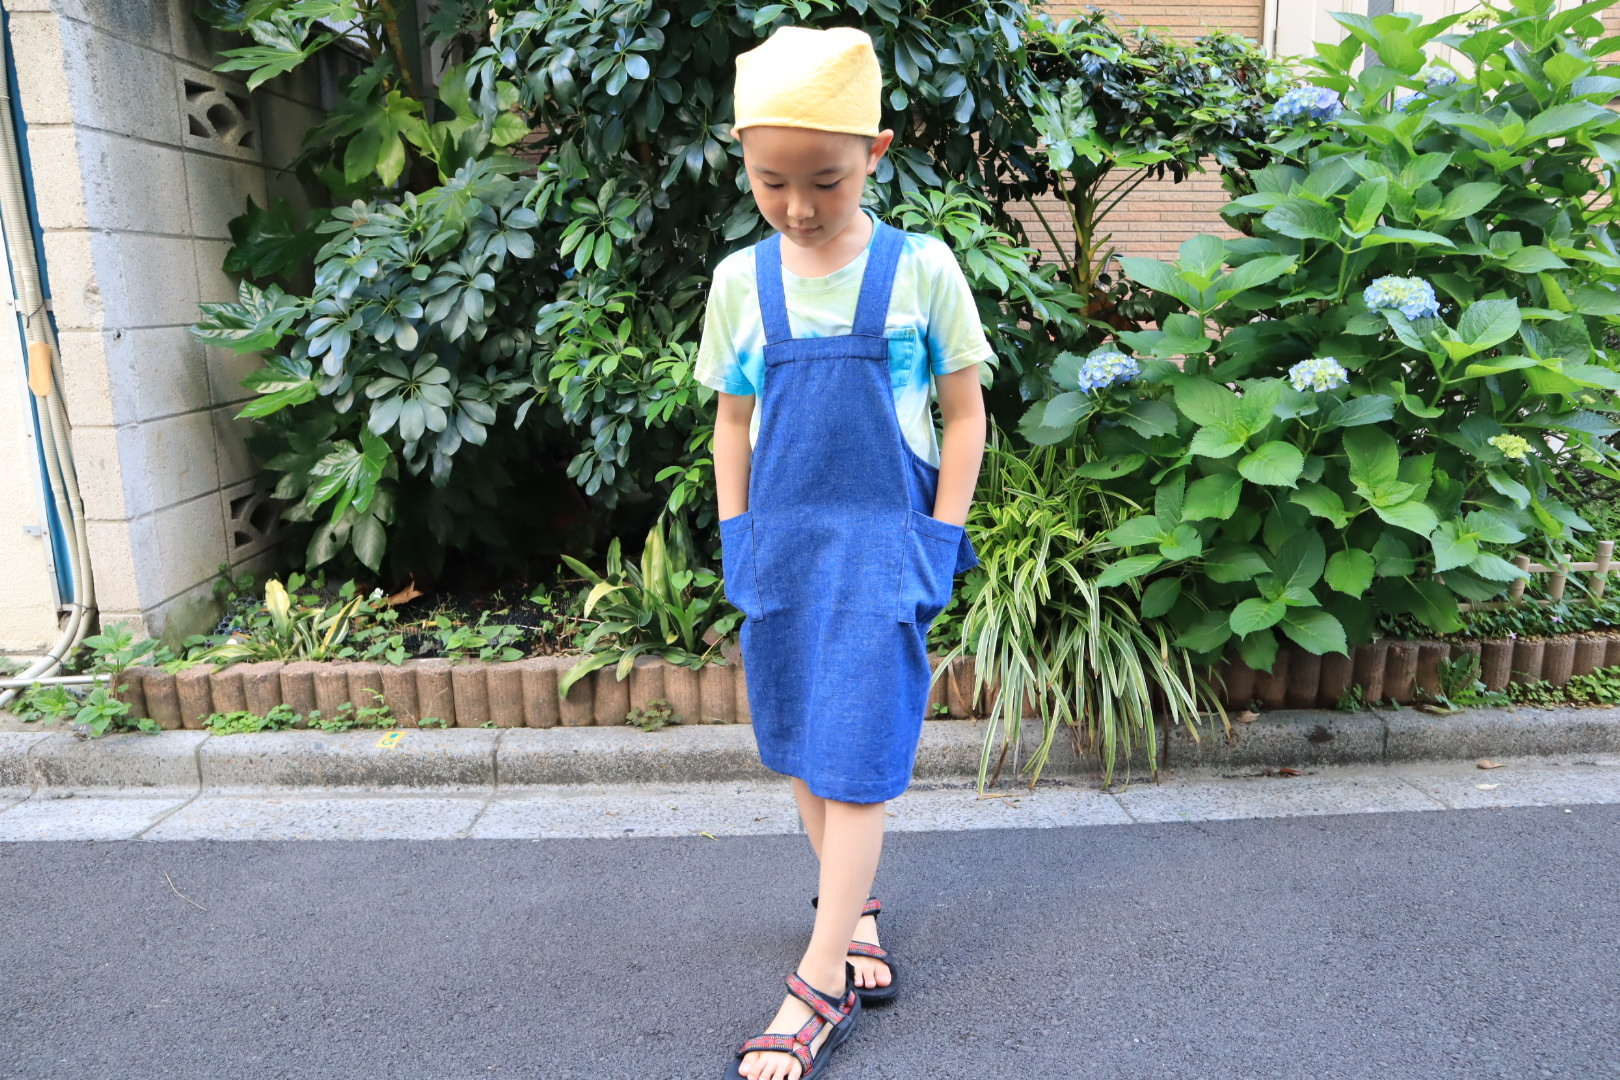 kidsコットンデニム エプロン(三角巾と巾着袋付き)